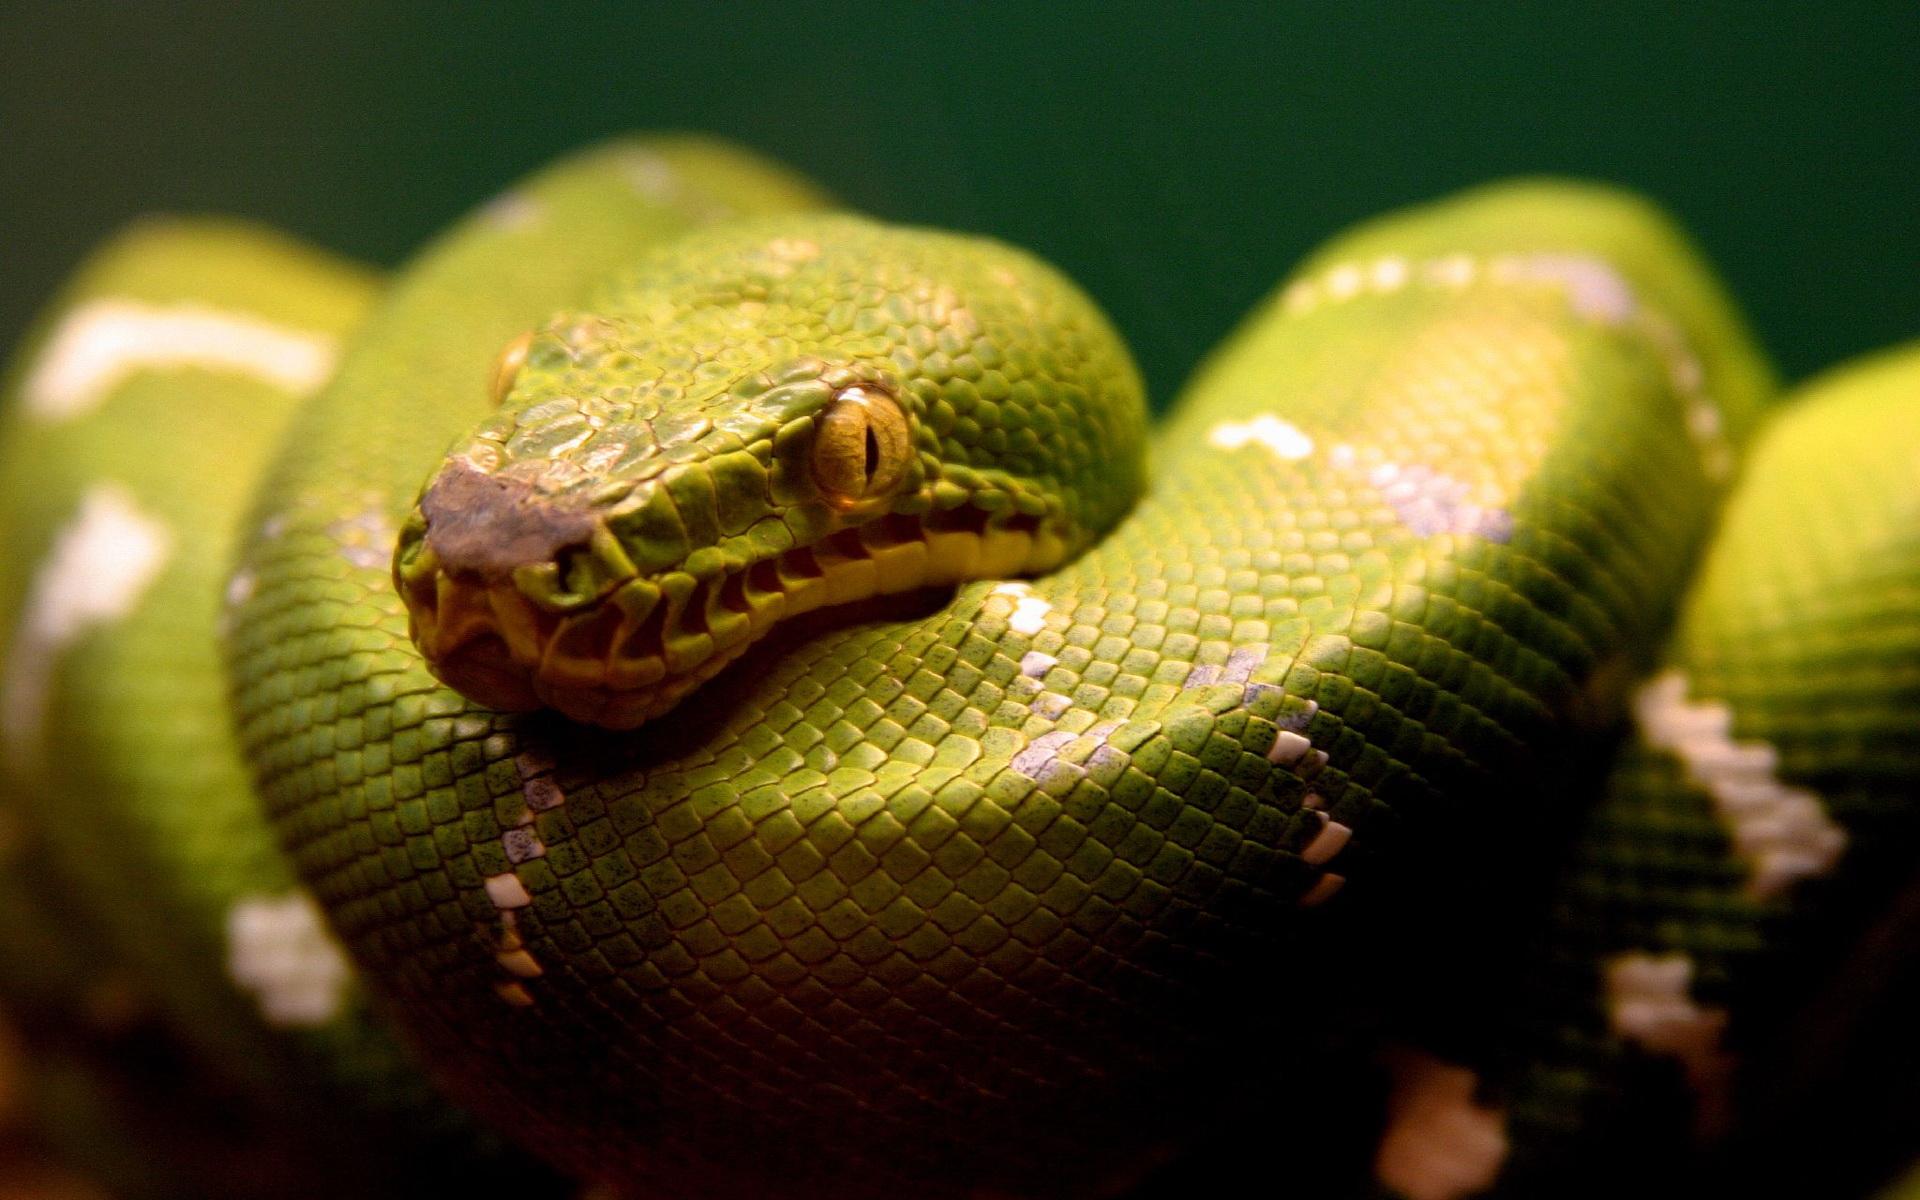 Desktop pics of venomous snake bites wallpaper 3d hd picture design 1920x1200